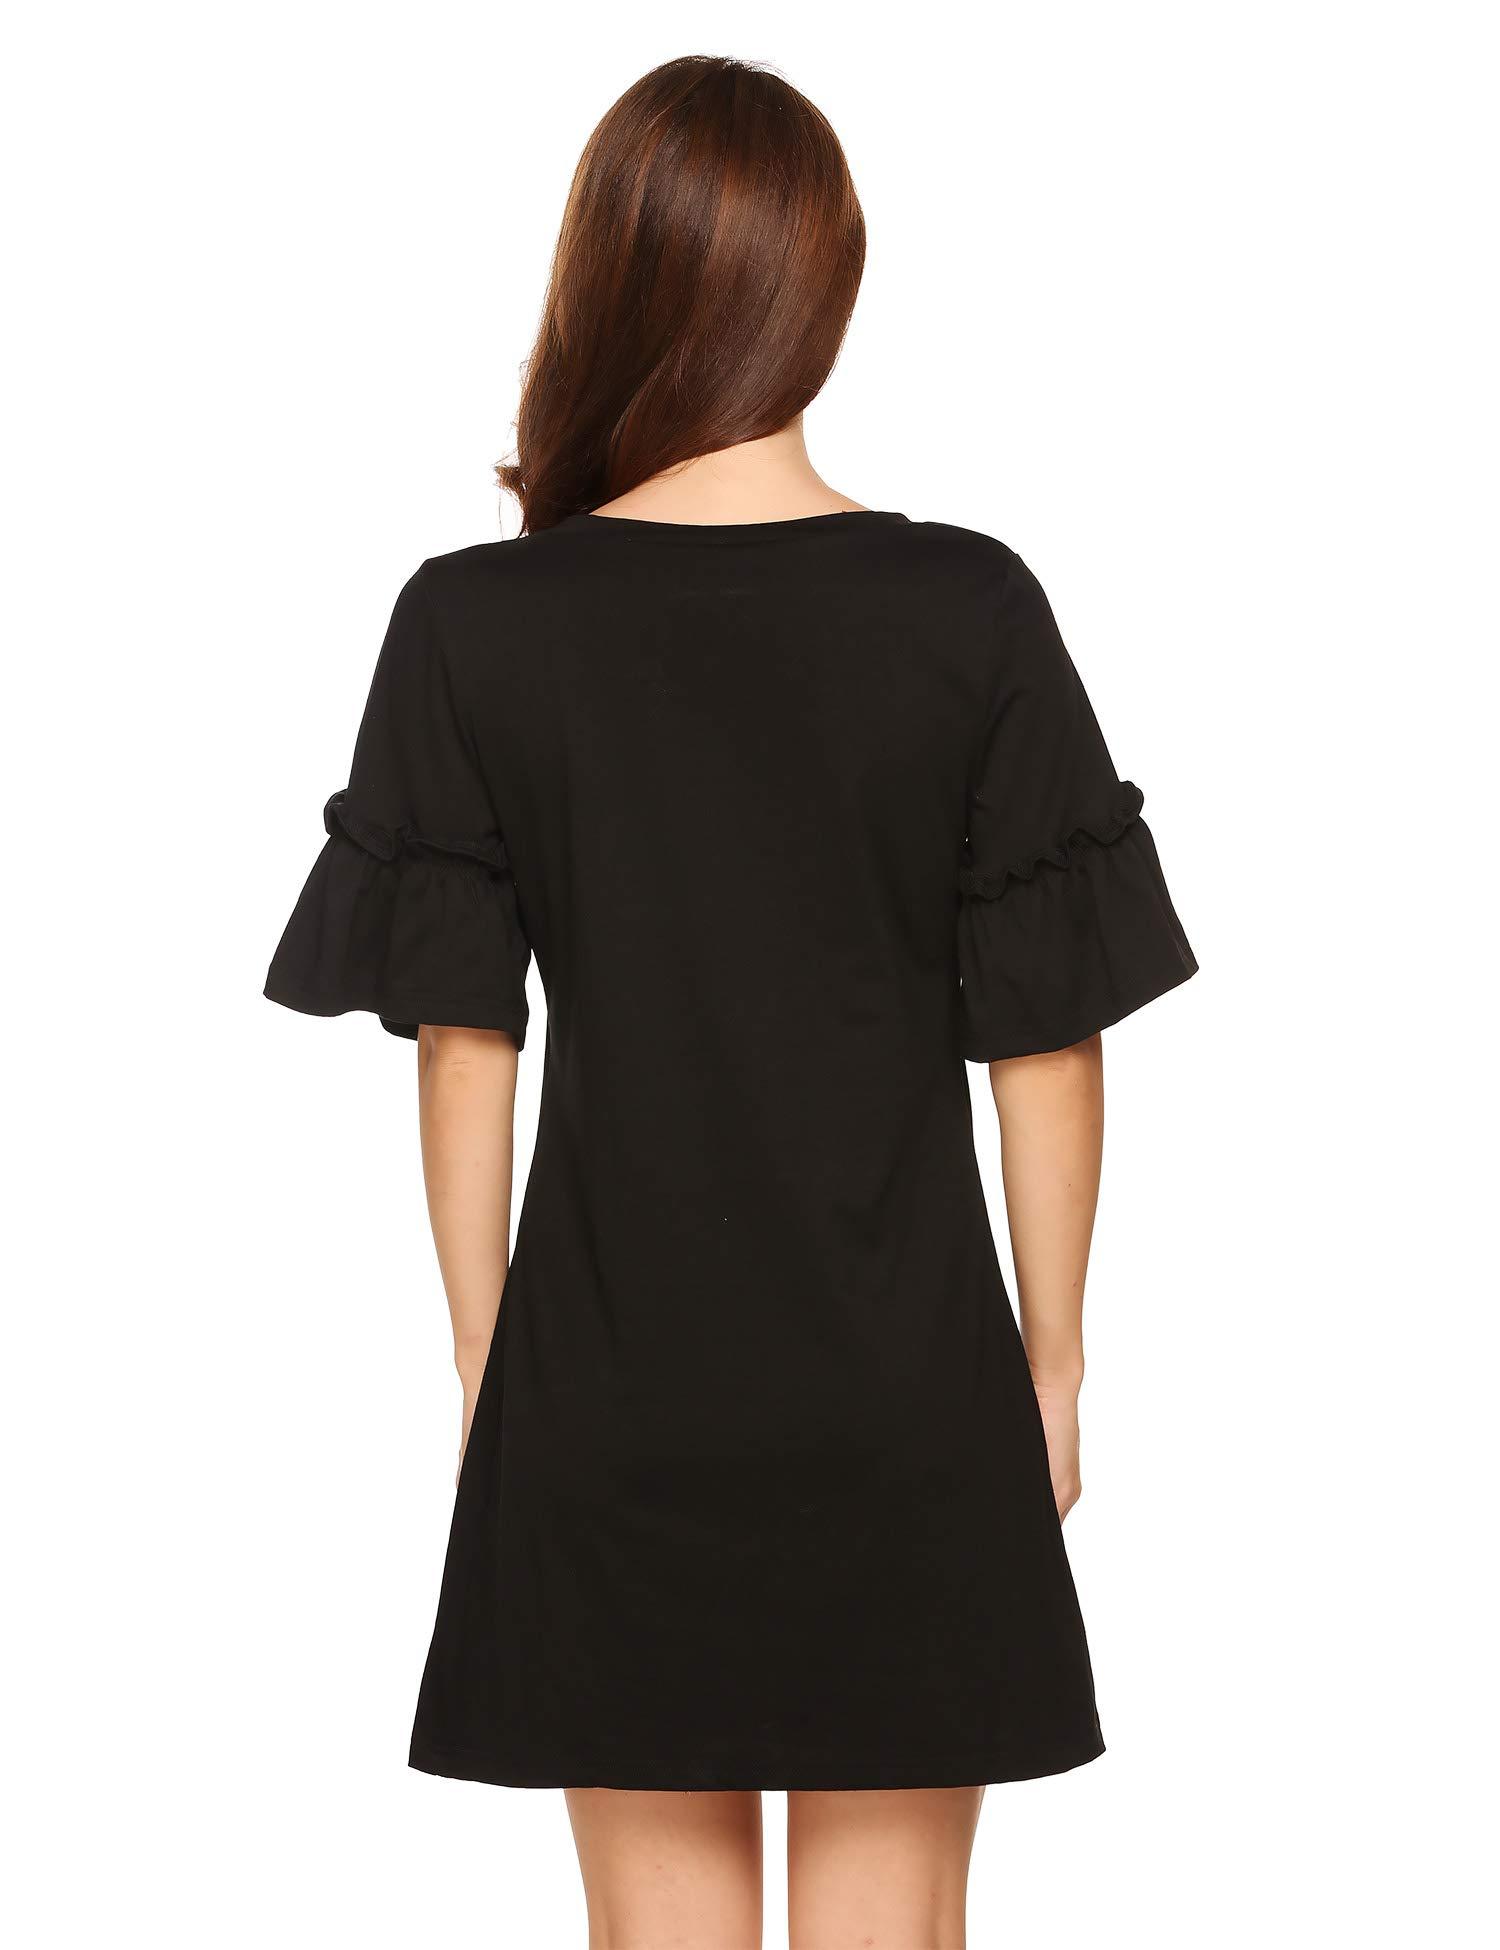 DonKap Women\'s Summer Sweet Cute Dress Casual Loose Bell Sleeve O Neck T Shirt Mini Dresses Black M